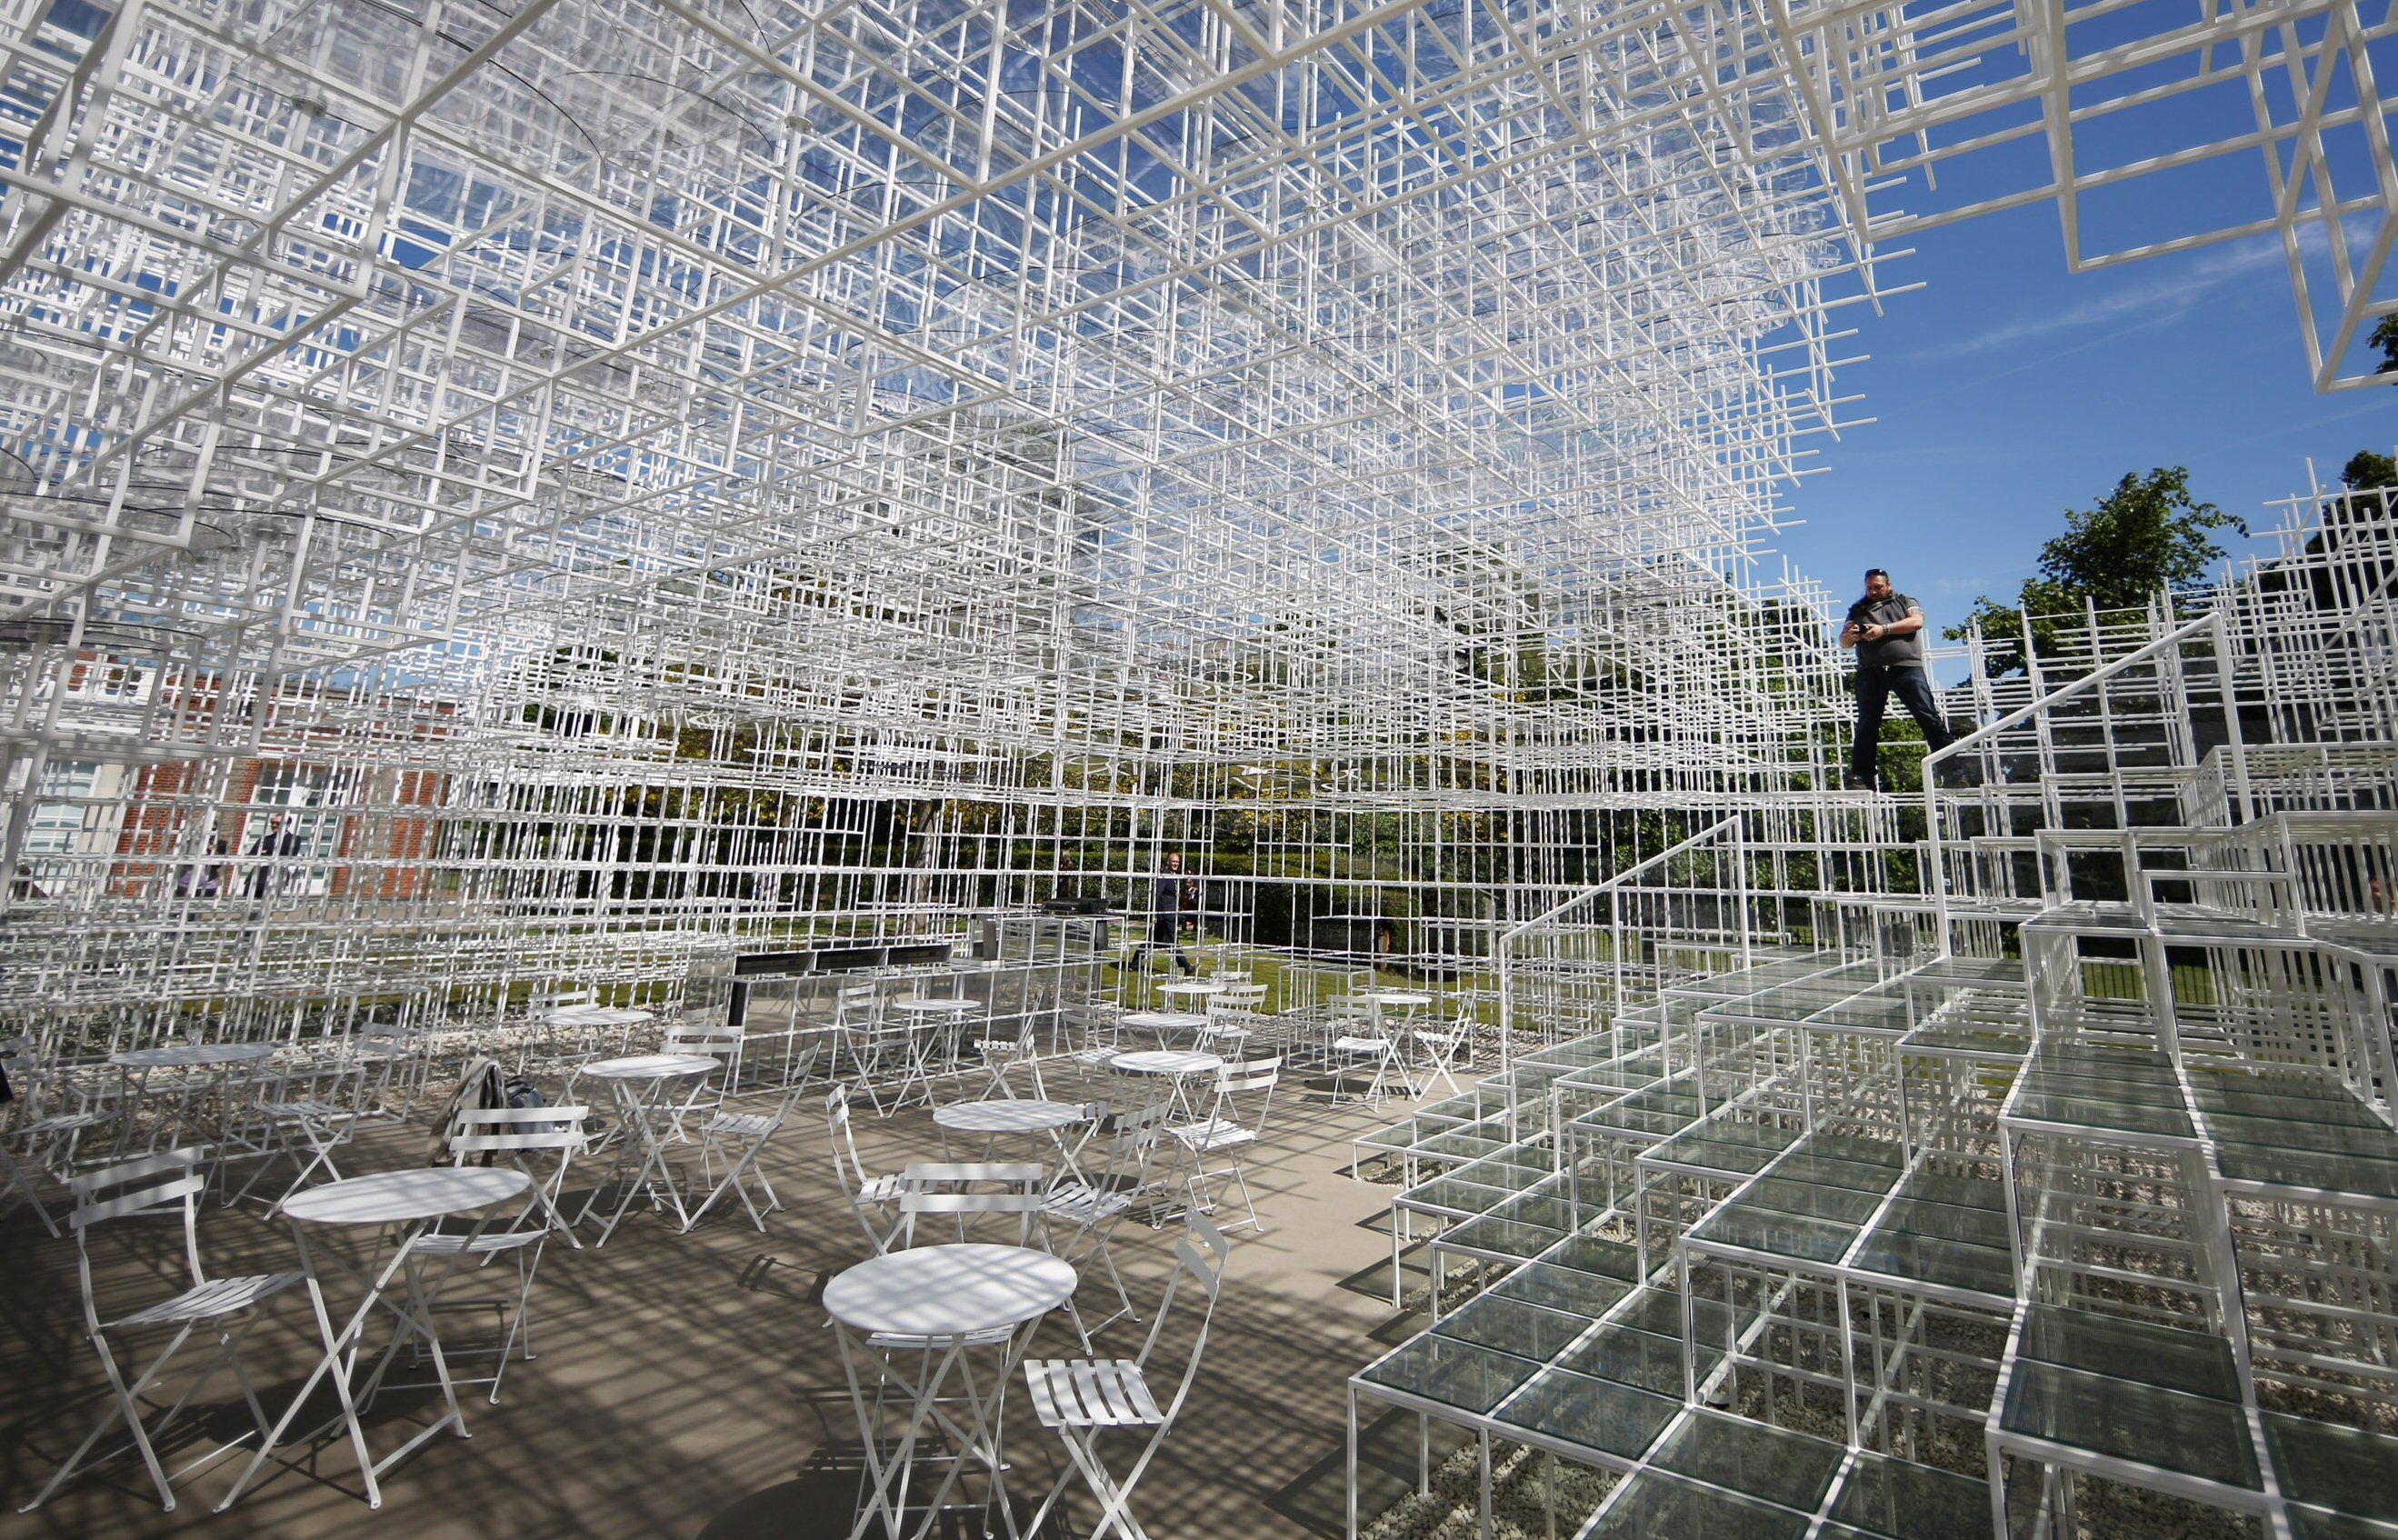 The Serpentine Gallery Pavilion Designed by Japanese architect Sou Fujimoto, 2013, London